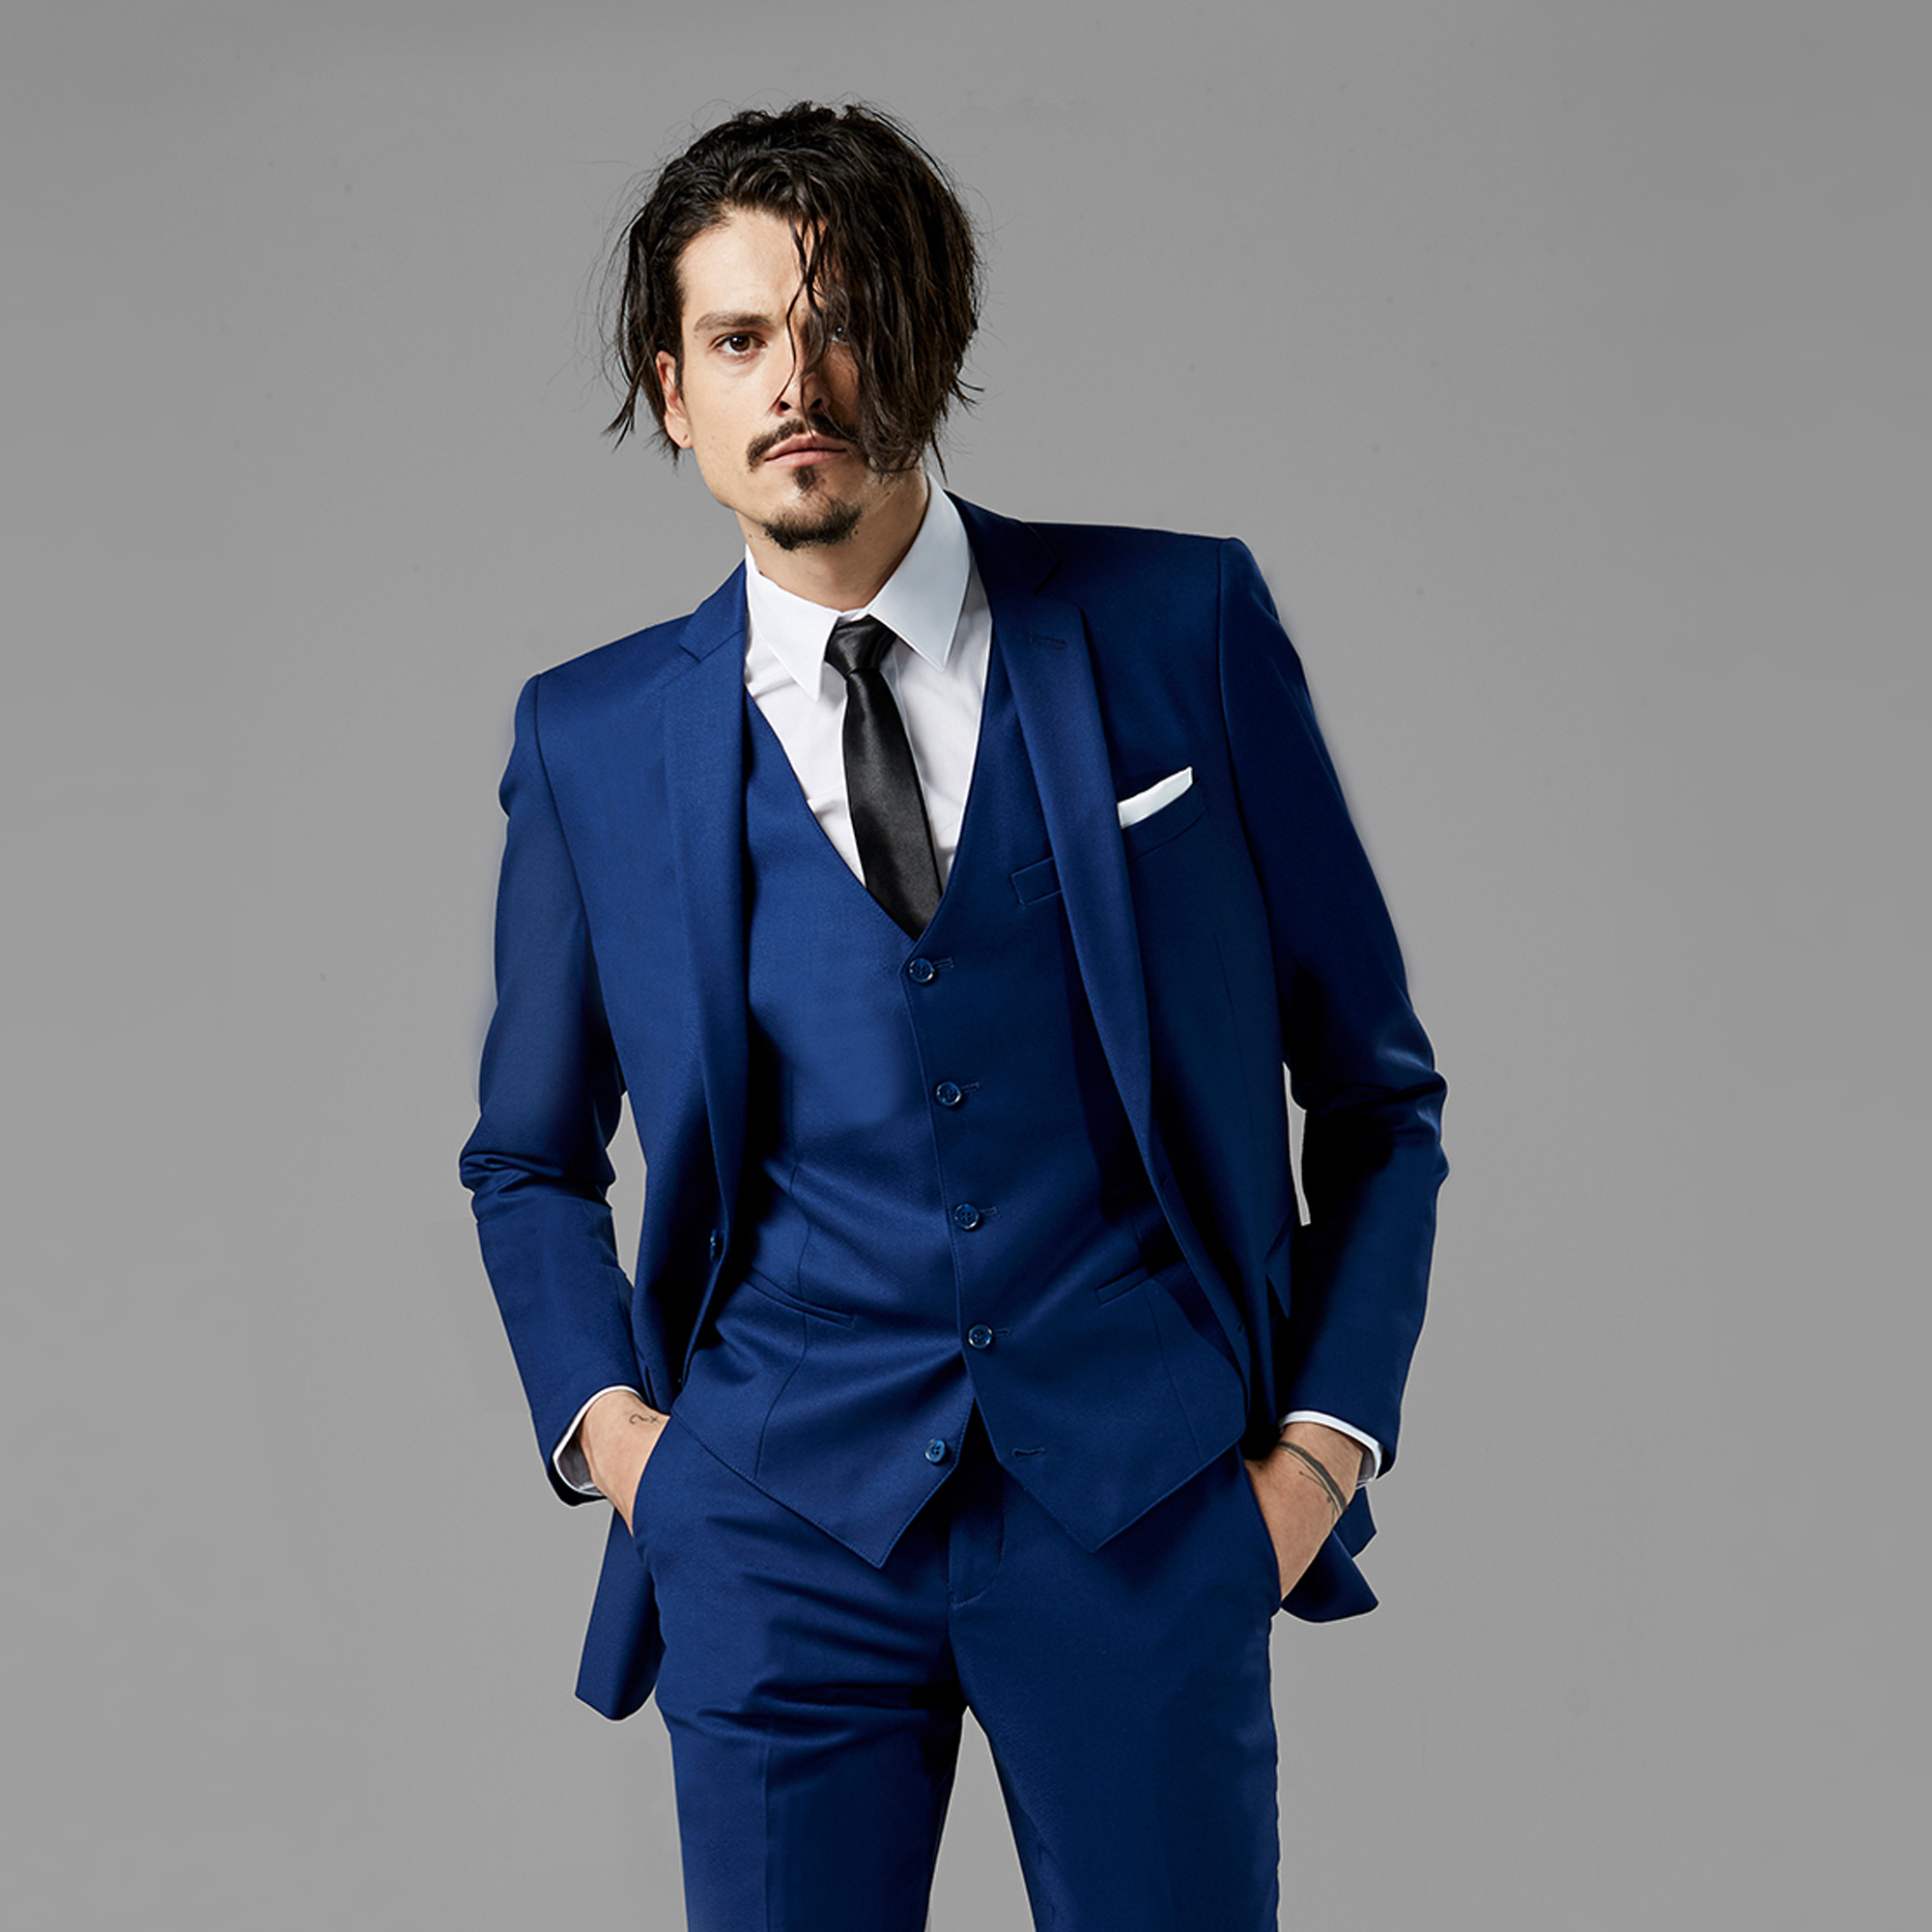 Men's tuxedo dress